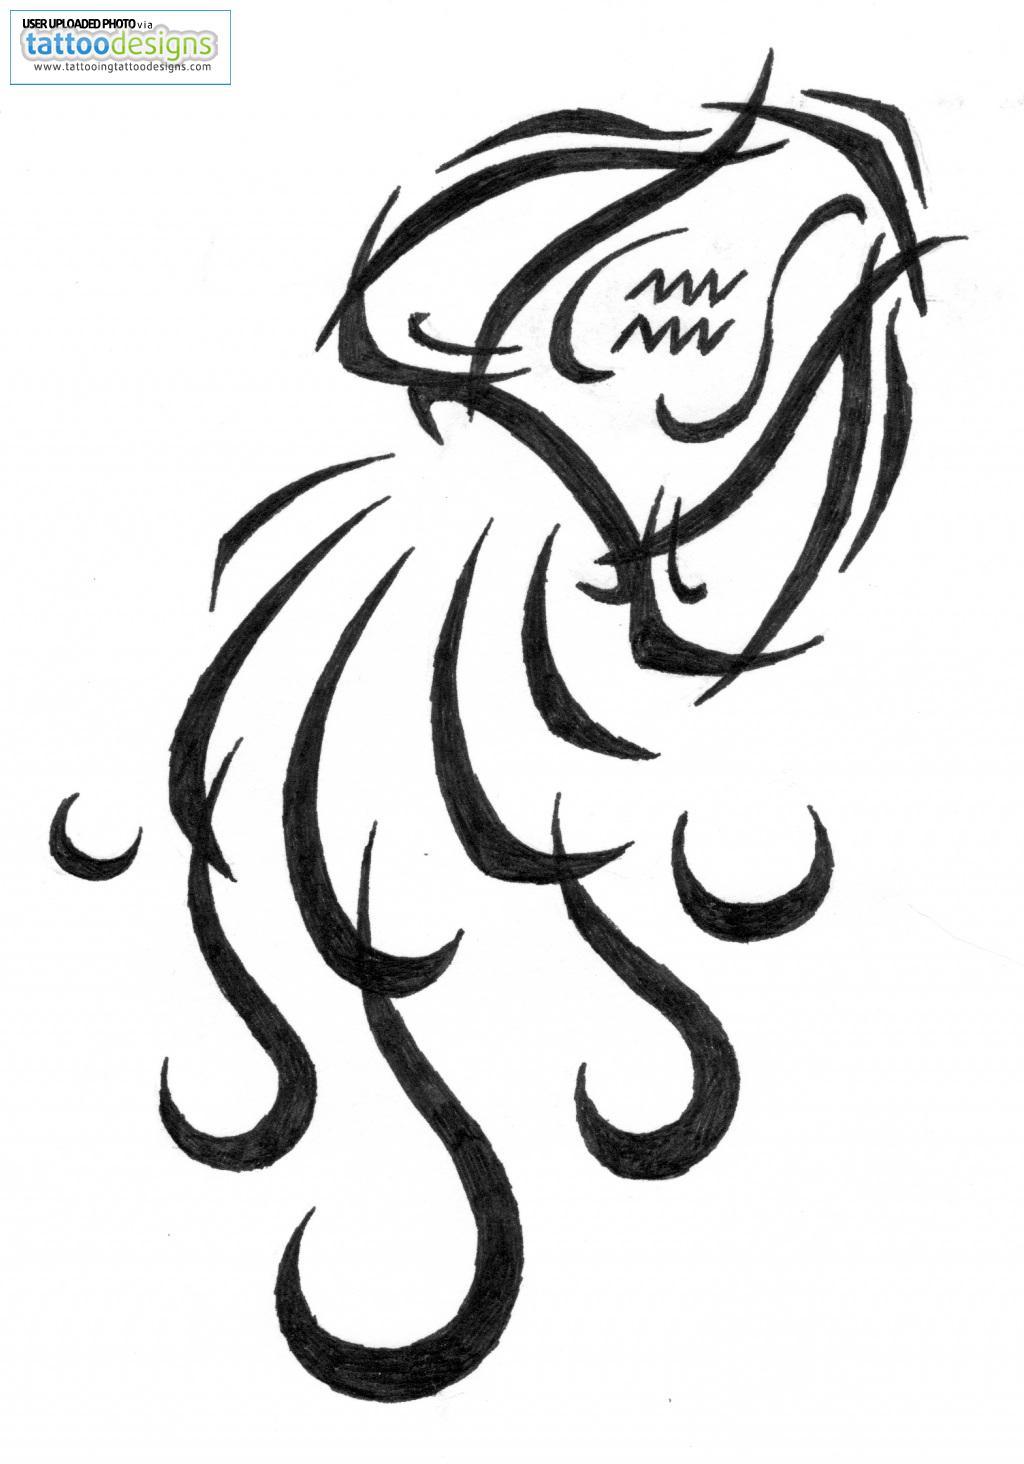 New Black Tribal Aquarius Tattoo Design